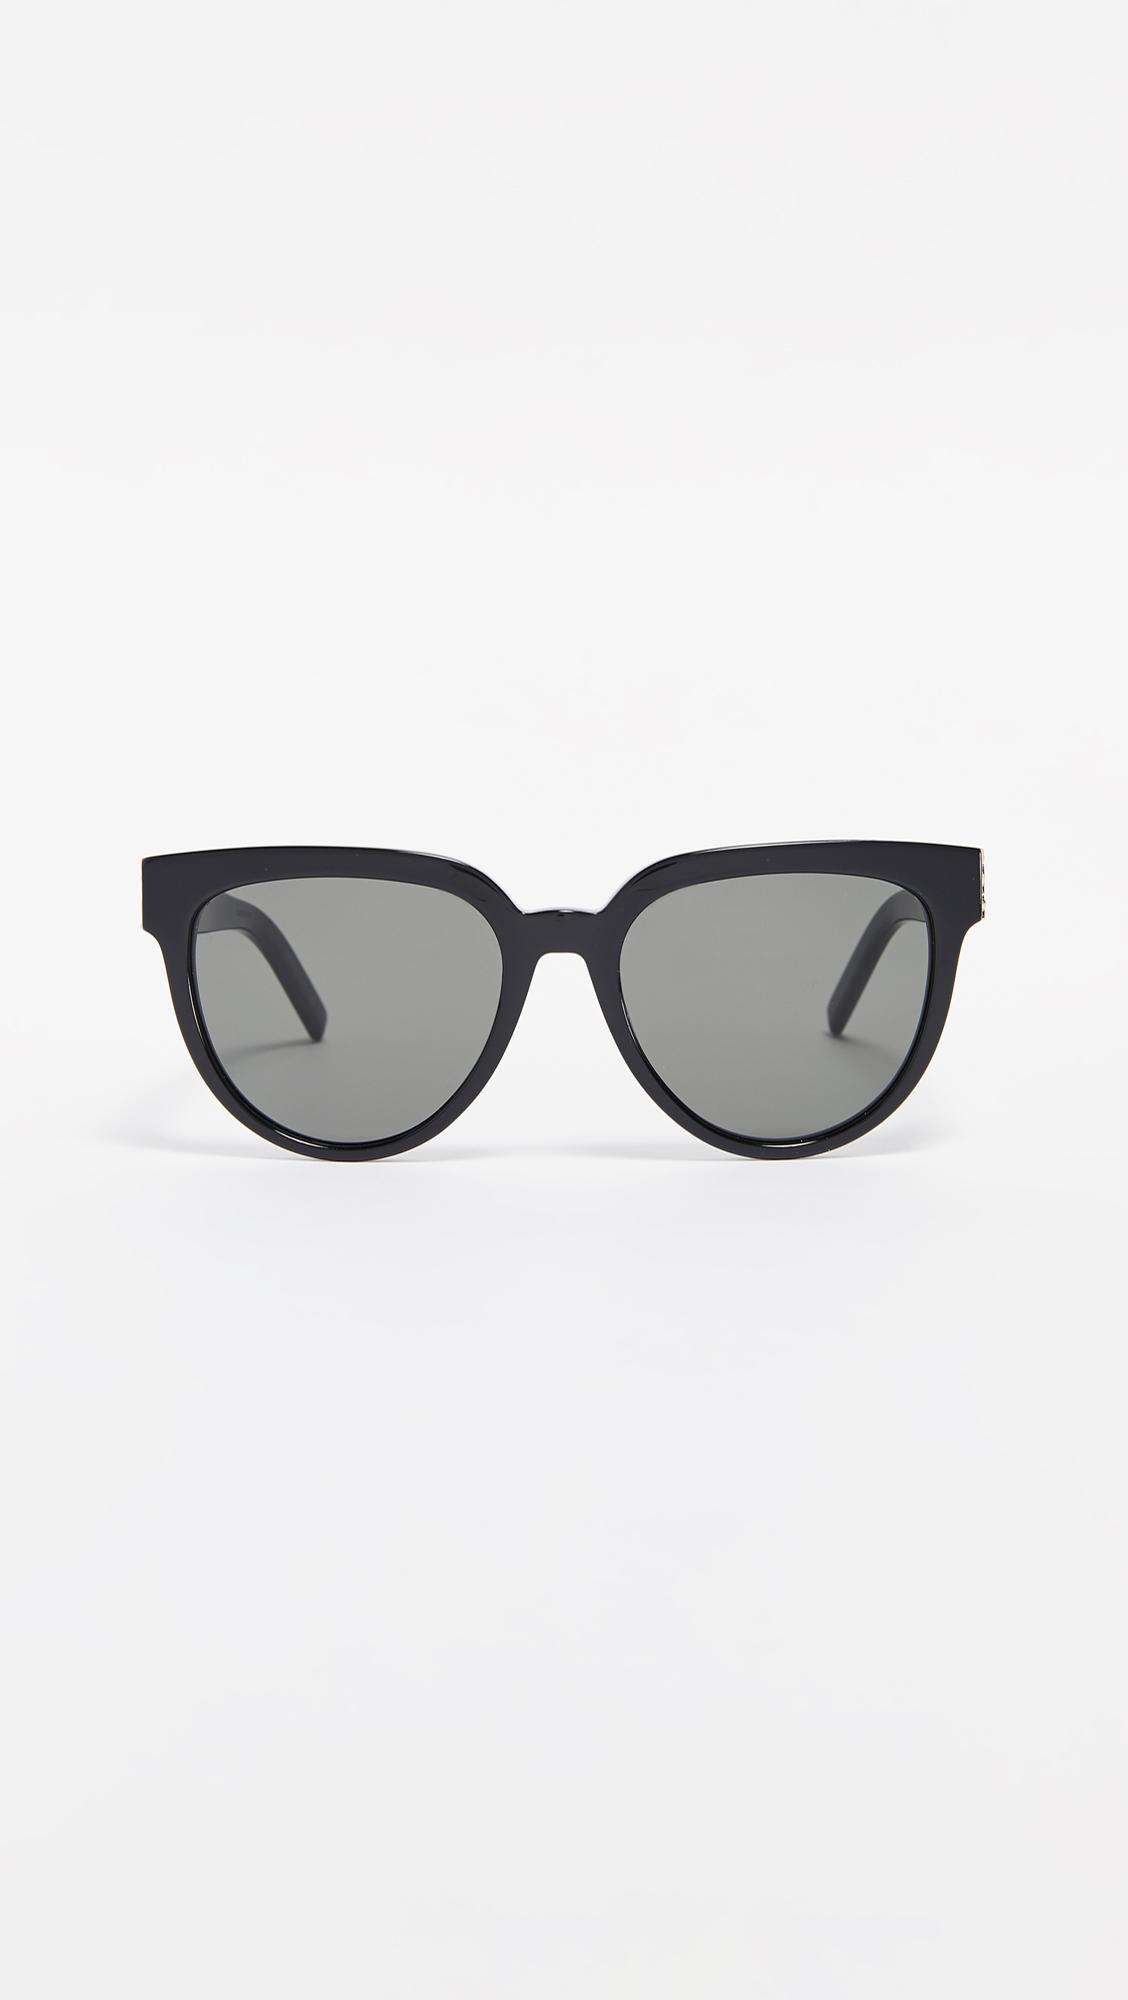 beee840a19 Saint Laurent. Women s Sl M28 Acetate Cat Eye Sunglasses